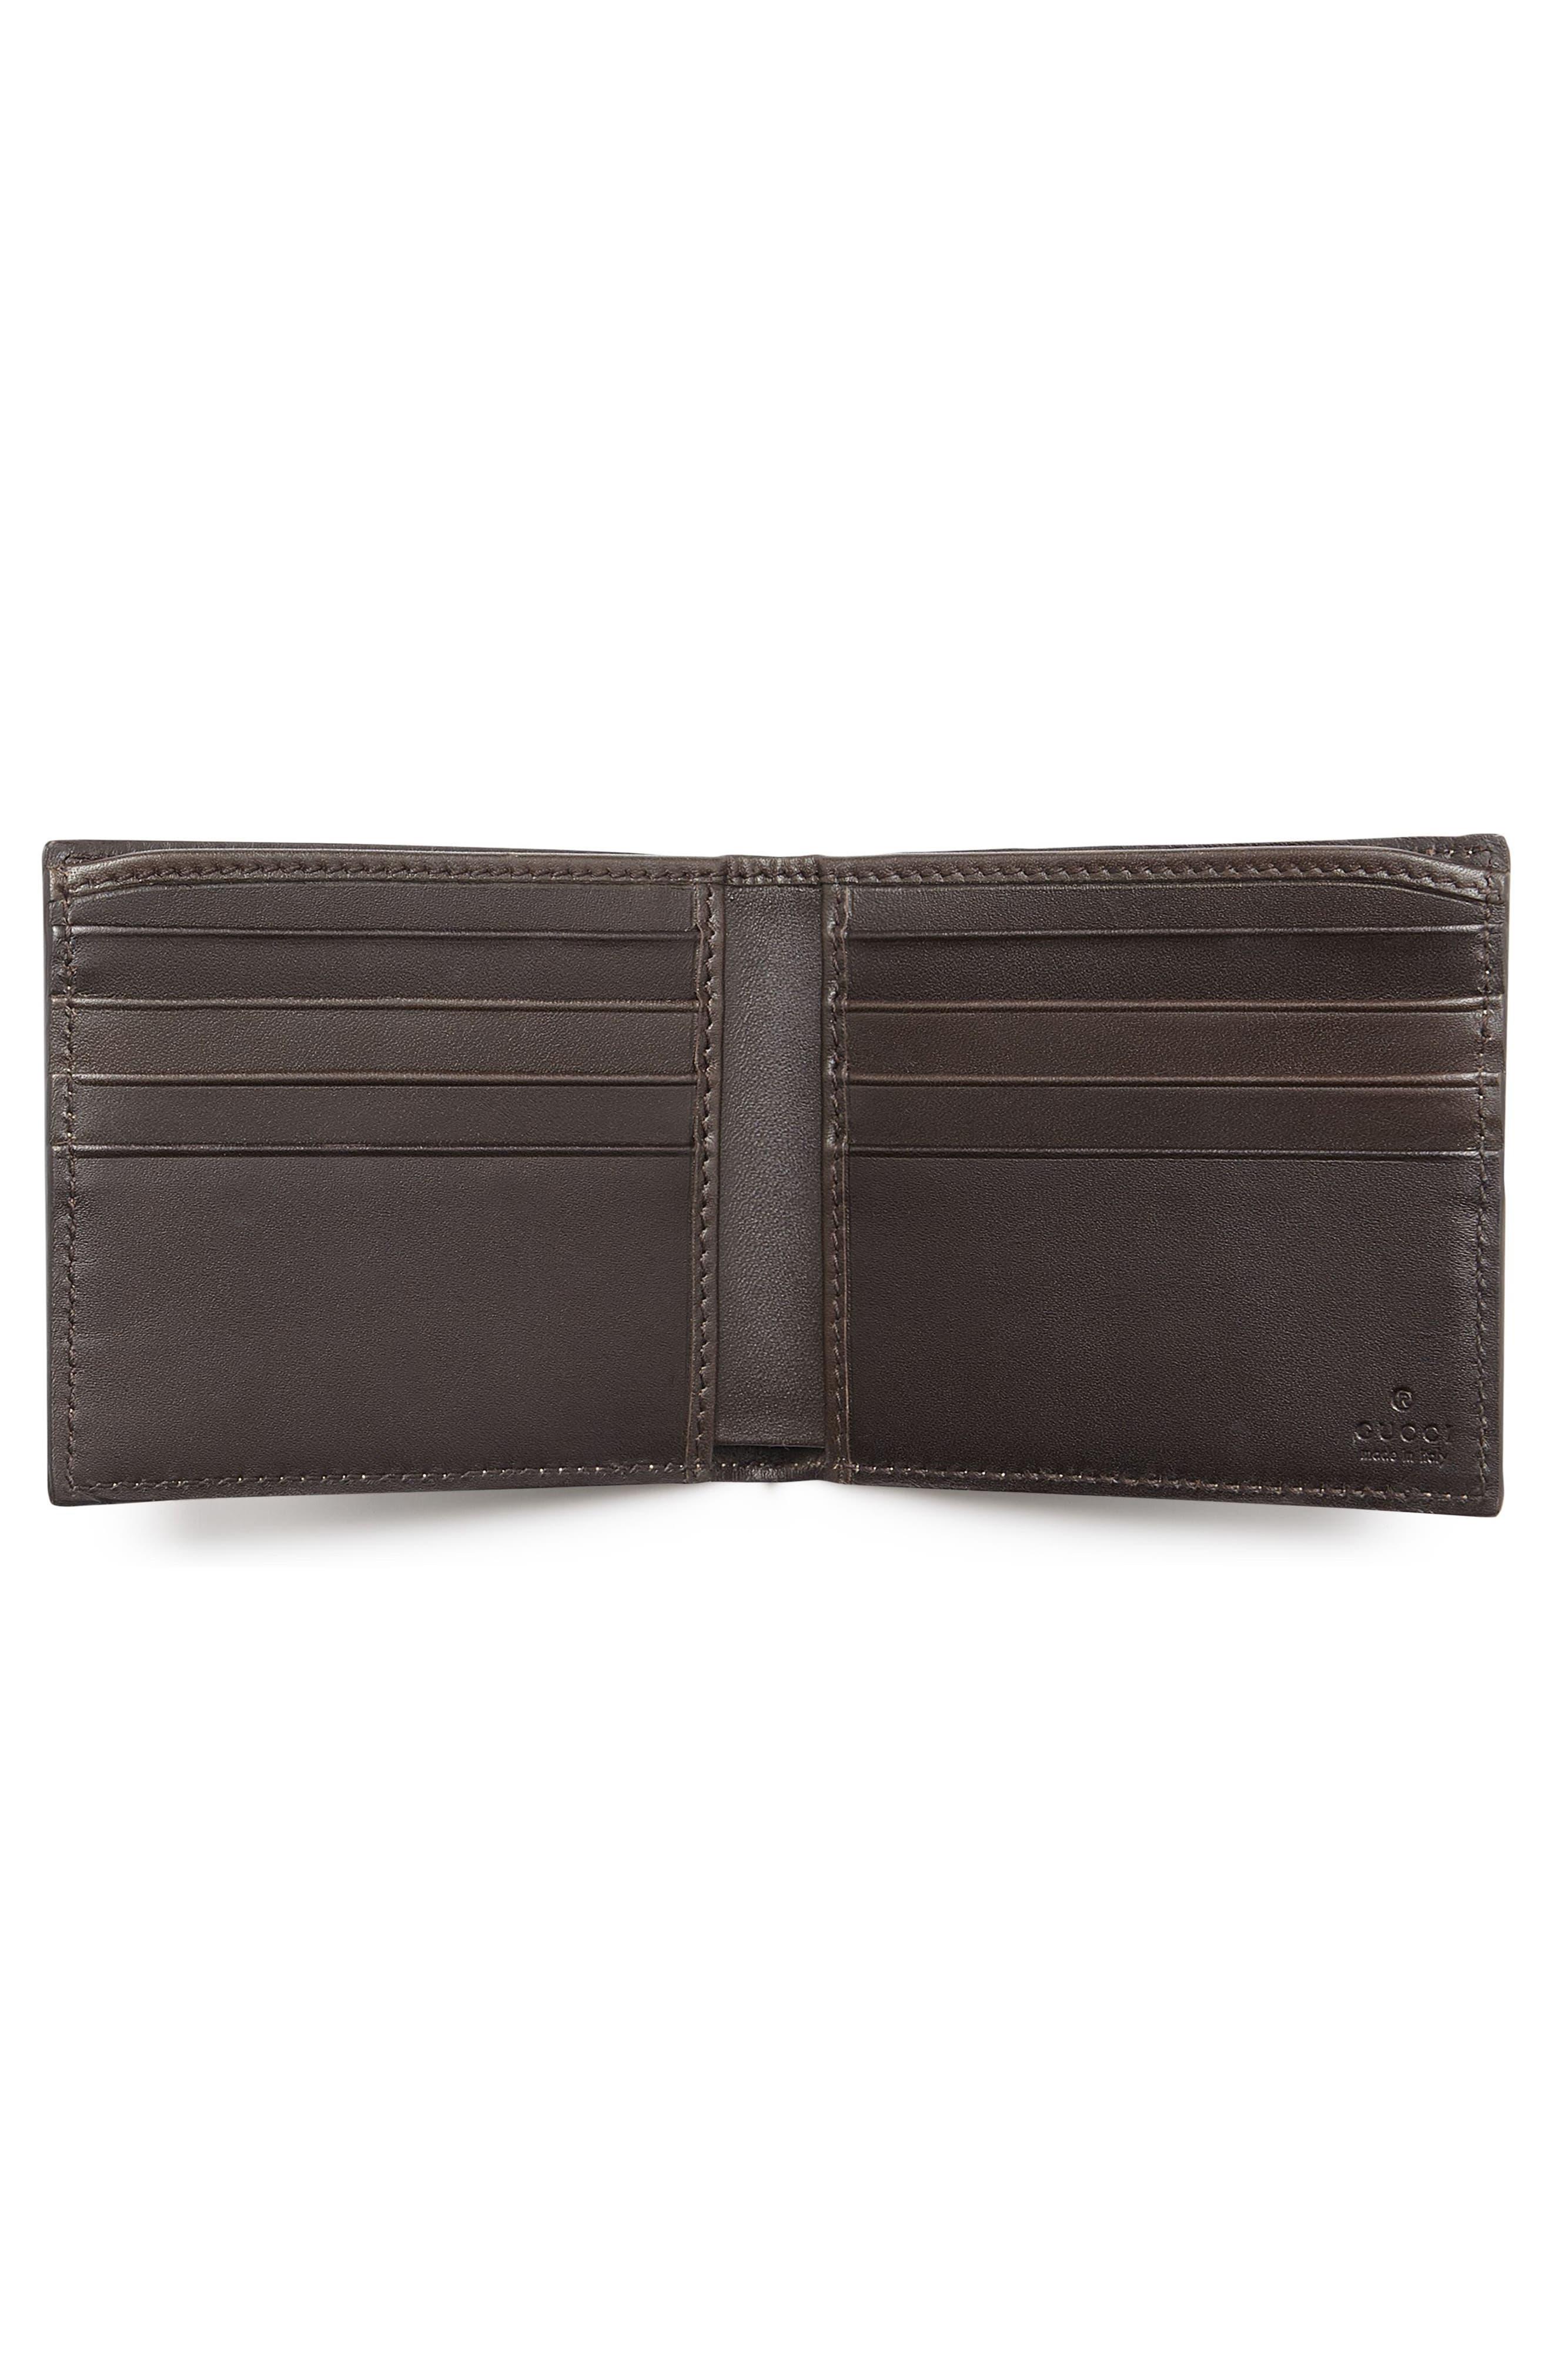 Supreme Wallet,                             Alternate thumbnail 8, color,